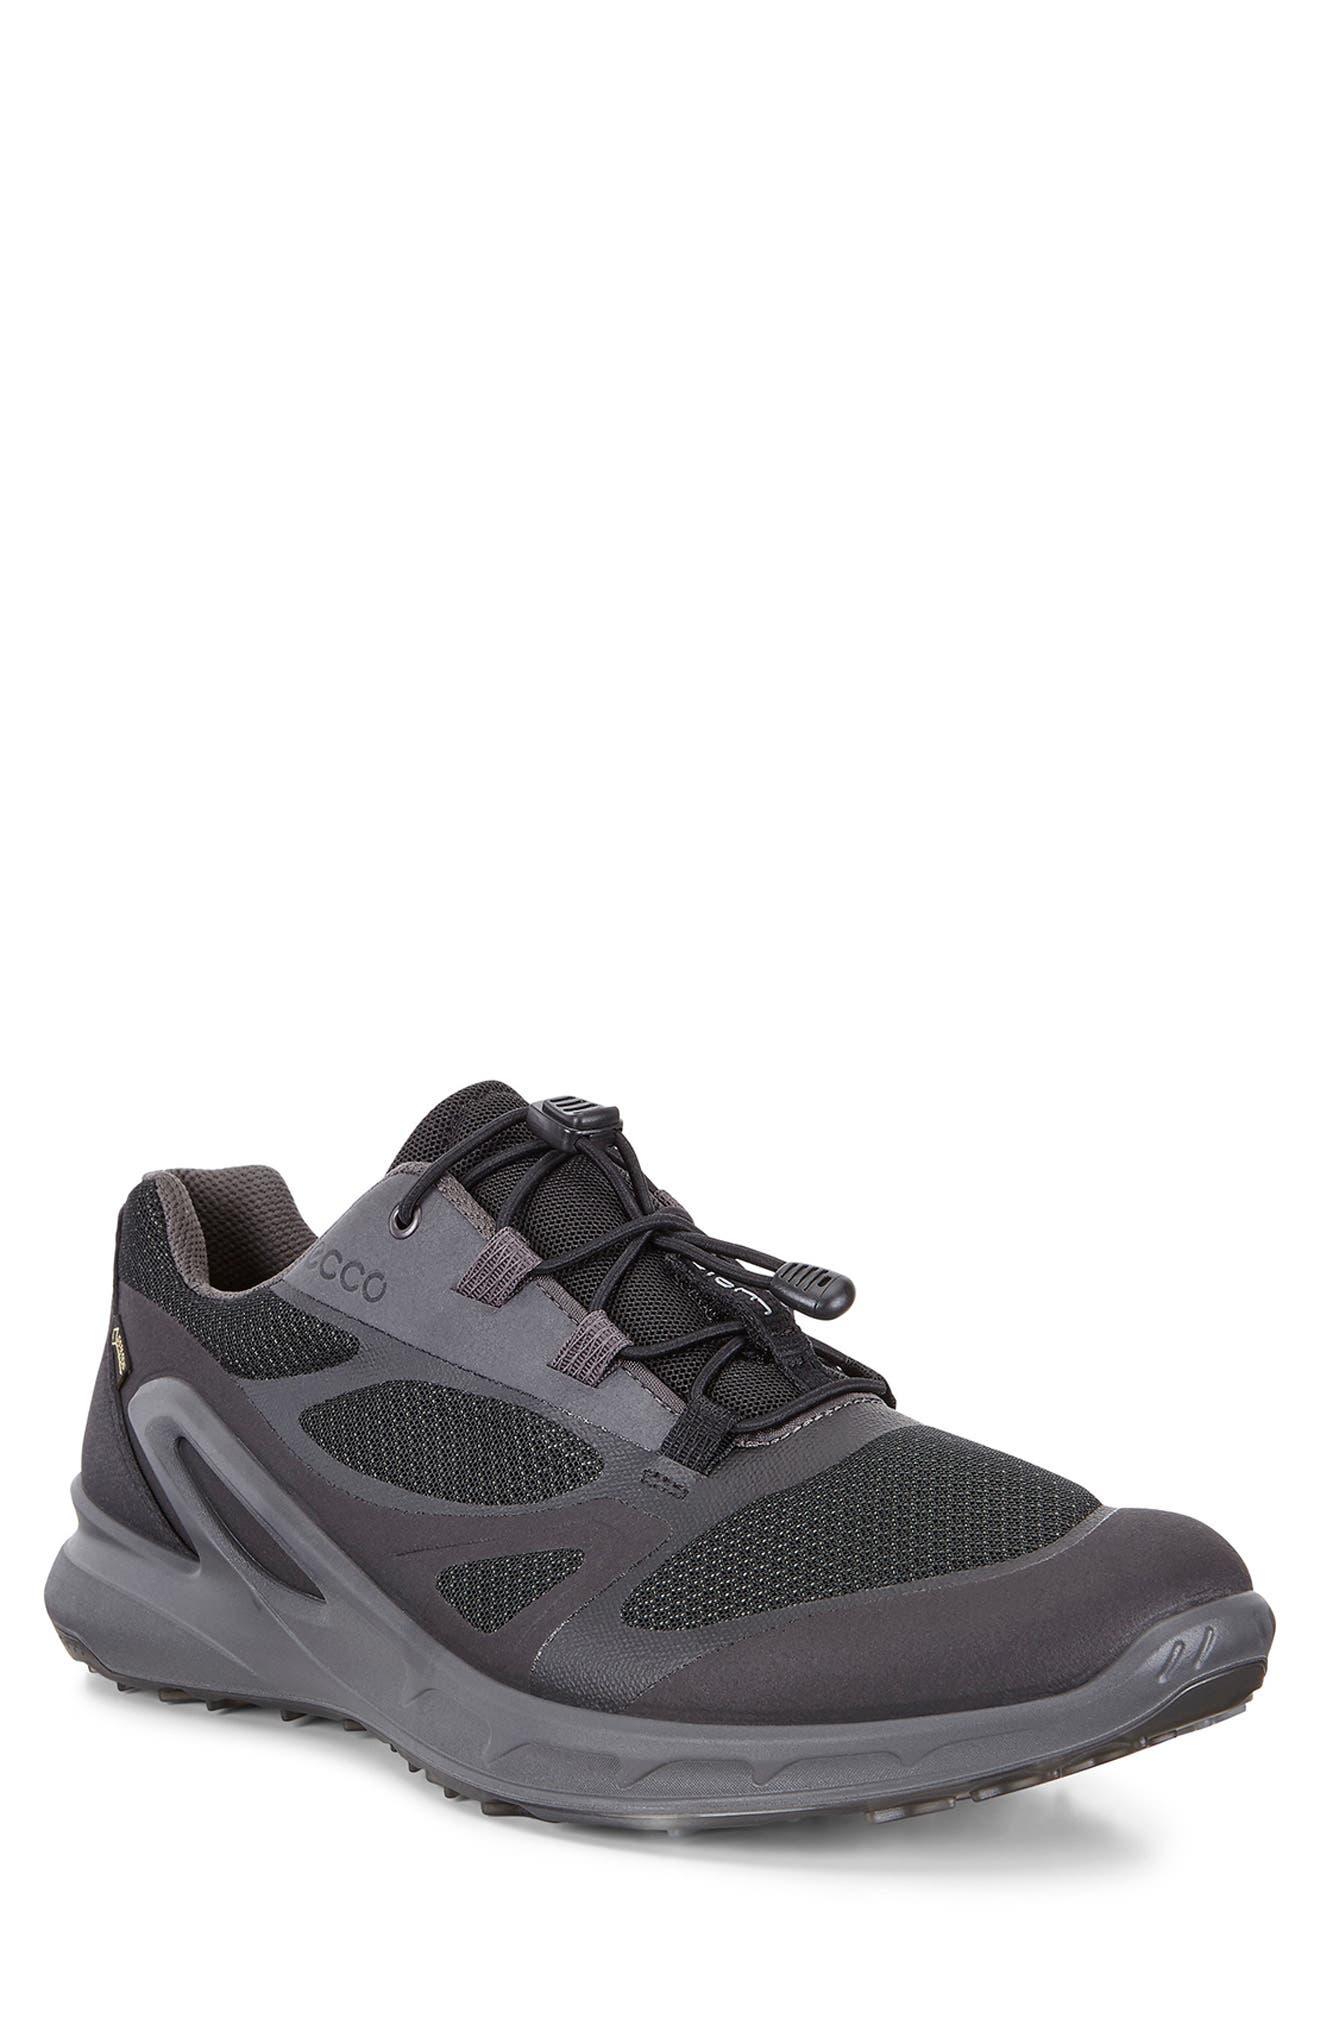 Ecco Biom Omniquest Gore-Tex Sneaker,12.5 - Black